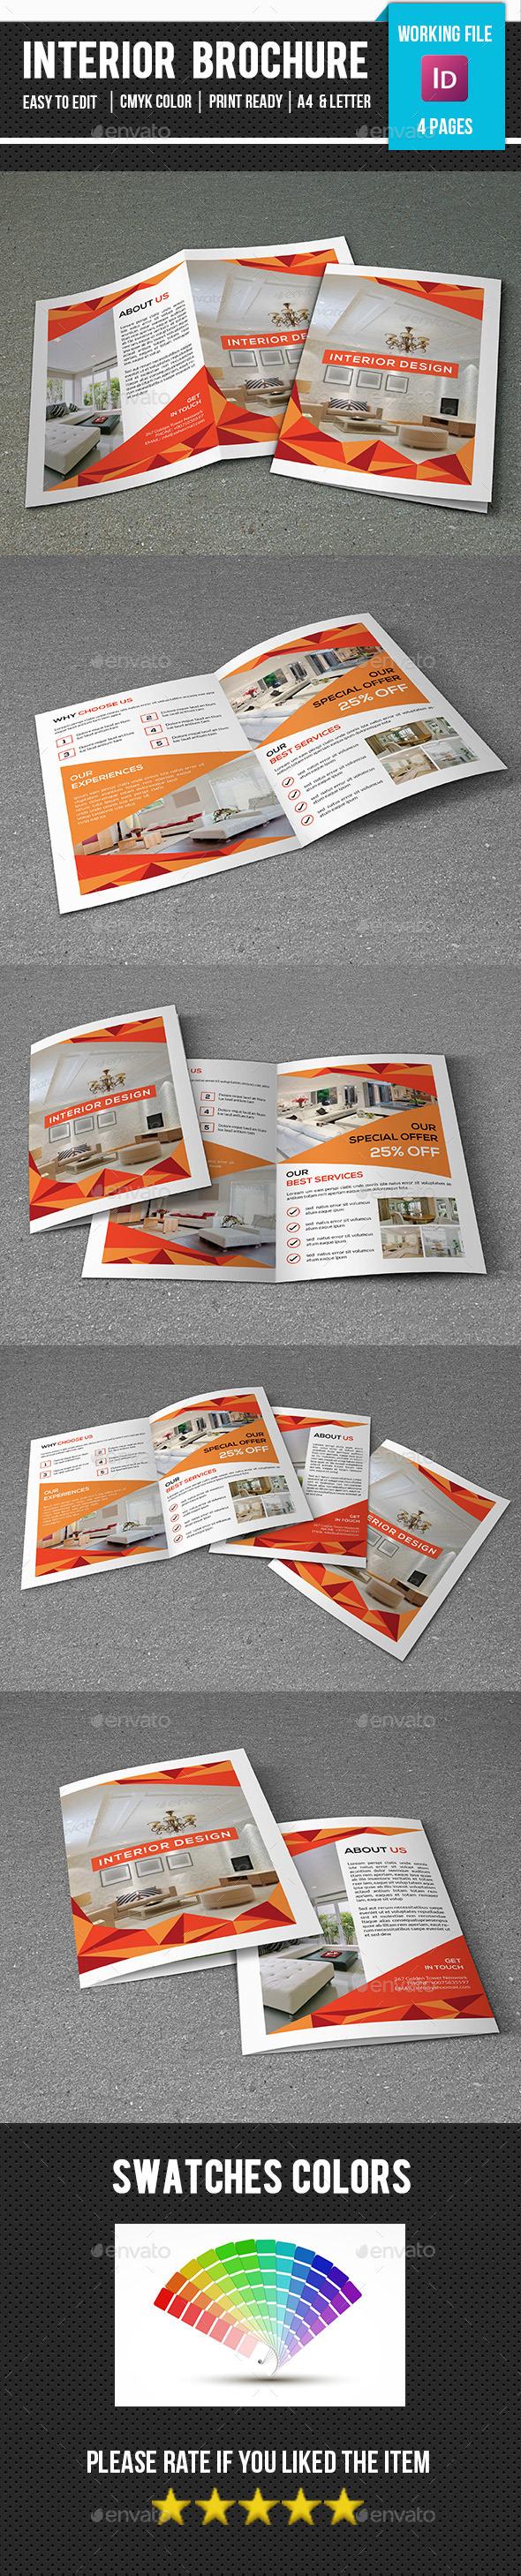 Interior Design Brochure-V358 - Corporate Brochures